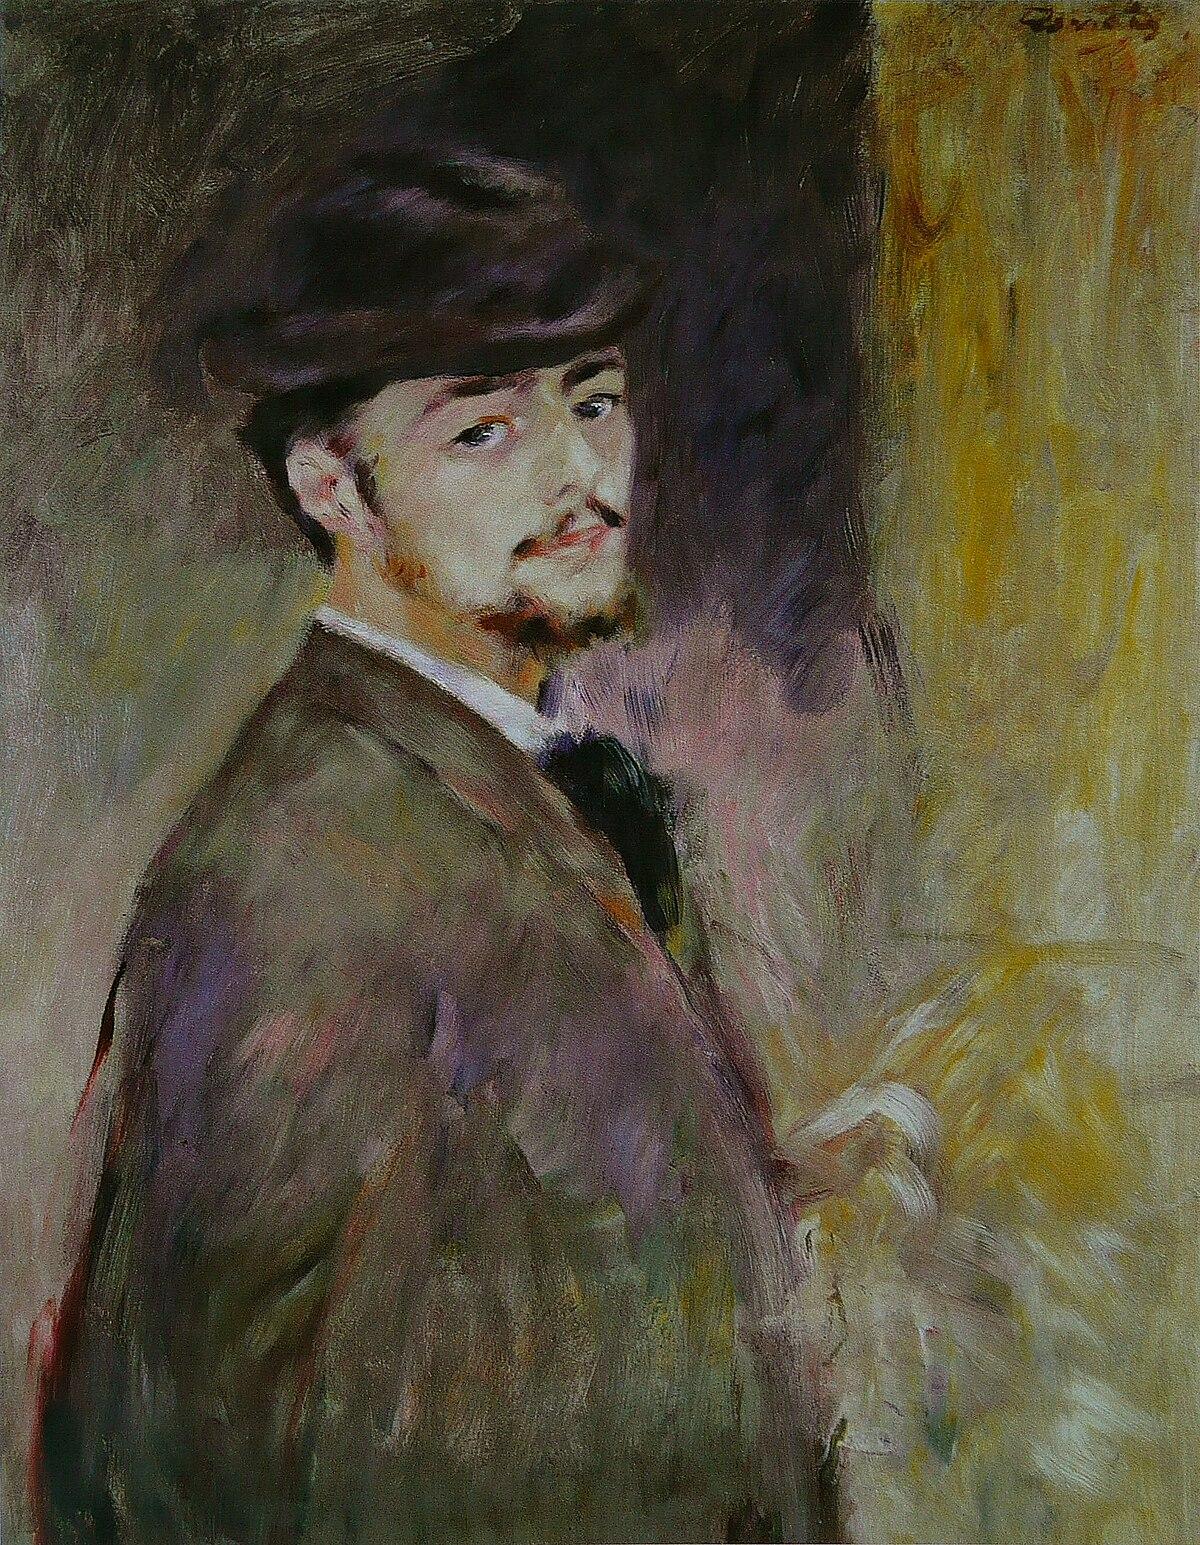 Pierre auguste renoir wikipedia for Auguste renoir